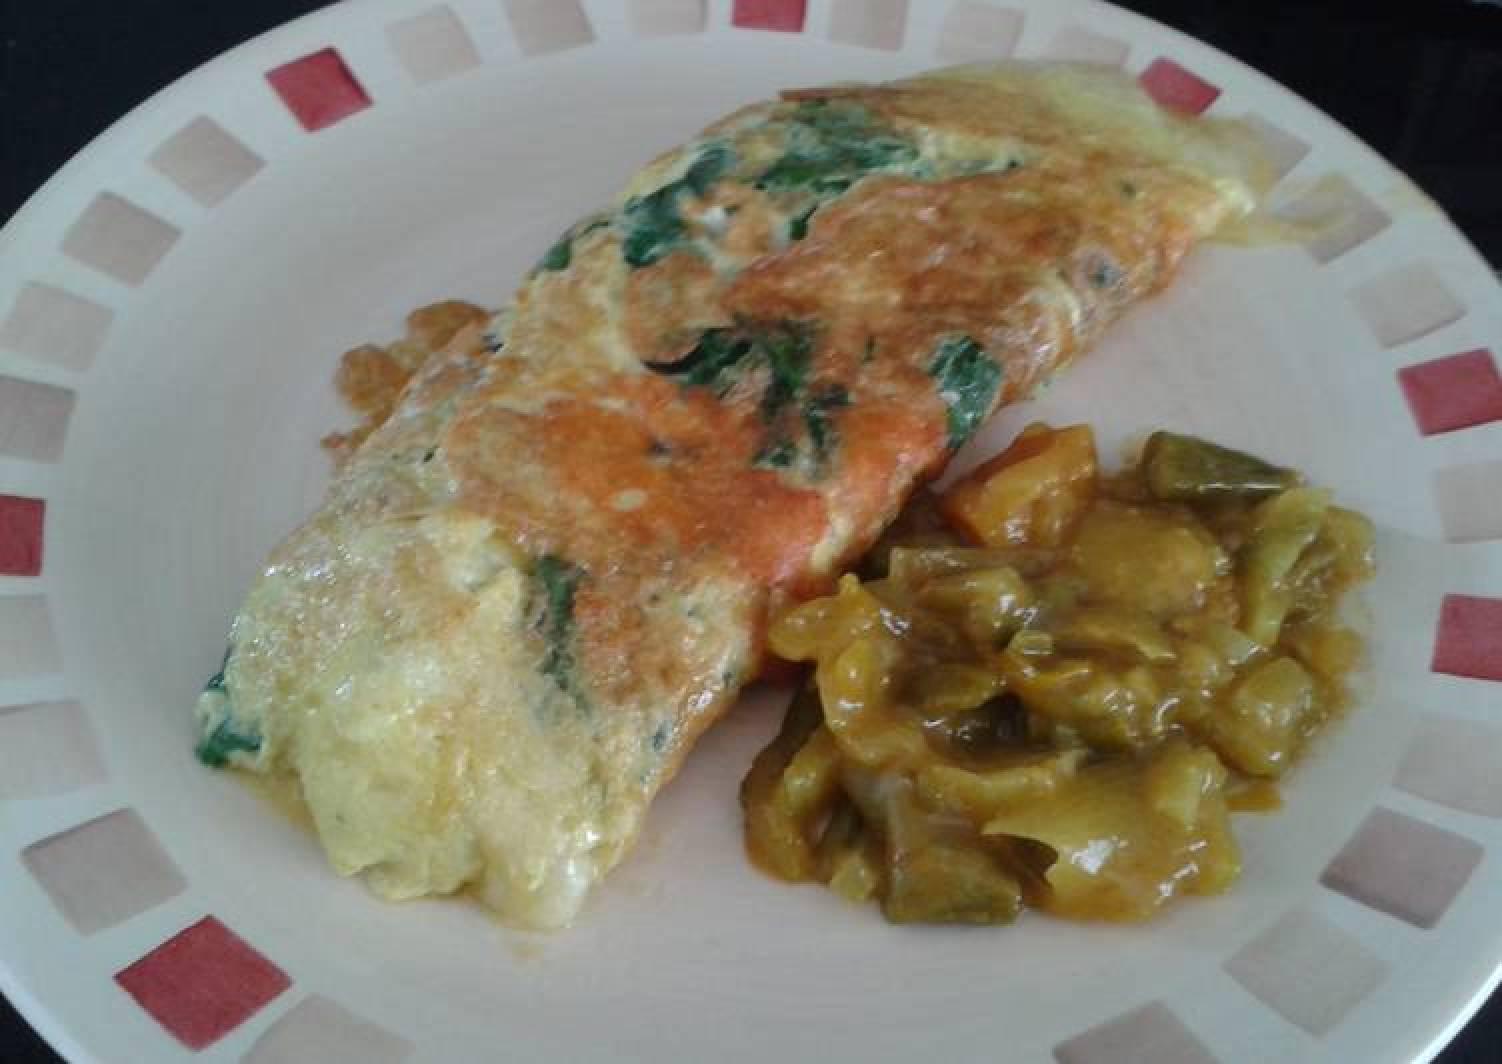 Garden spinach omelette